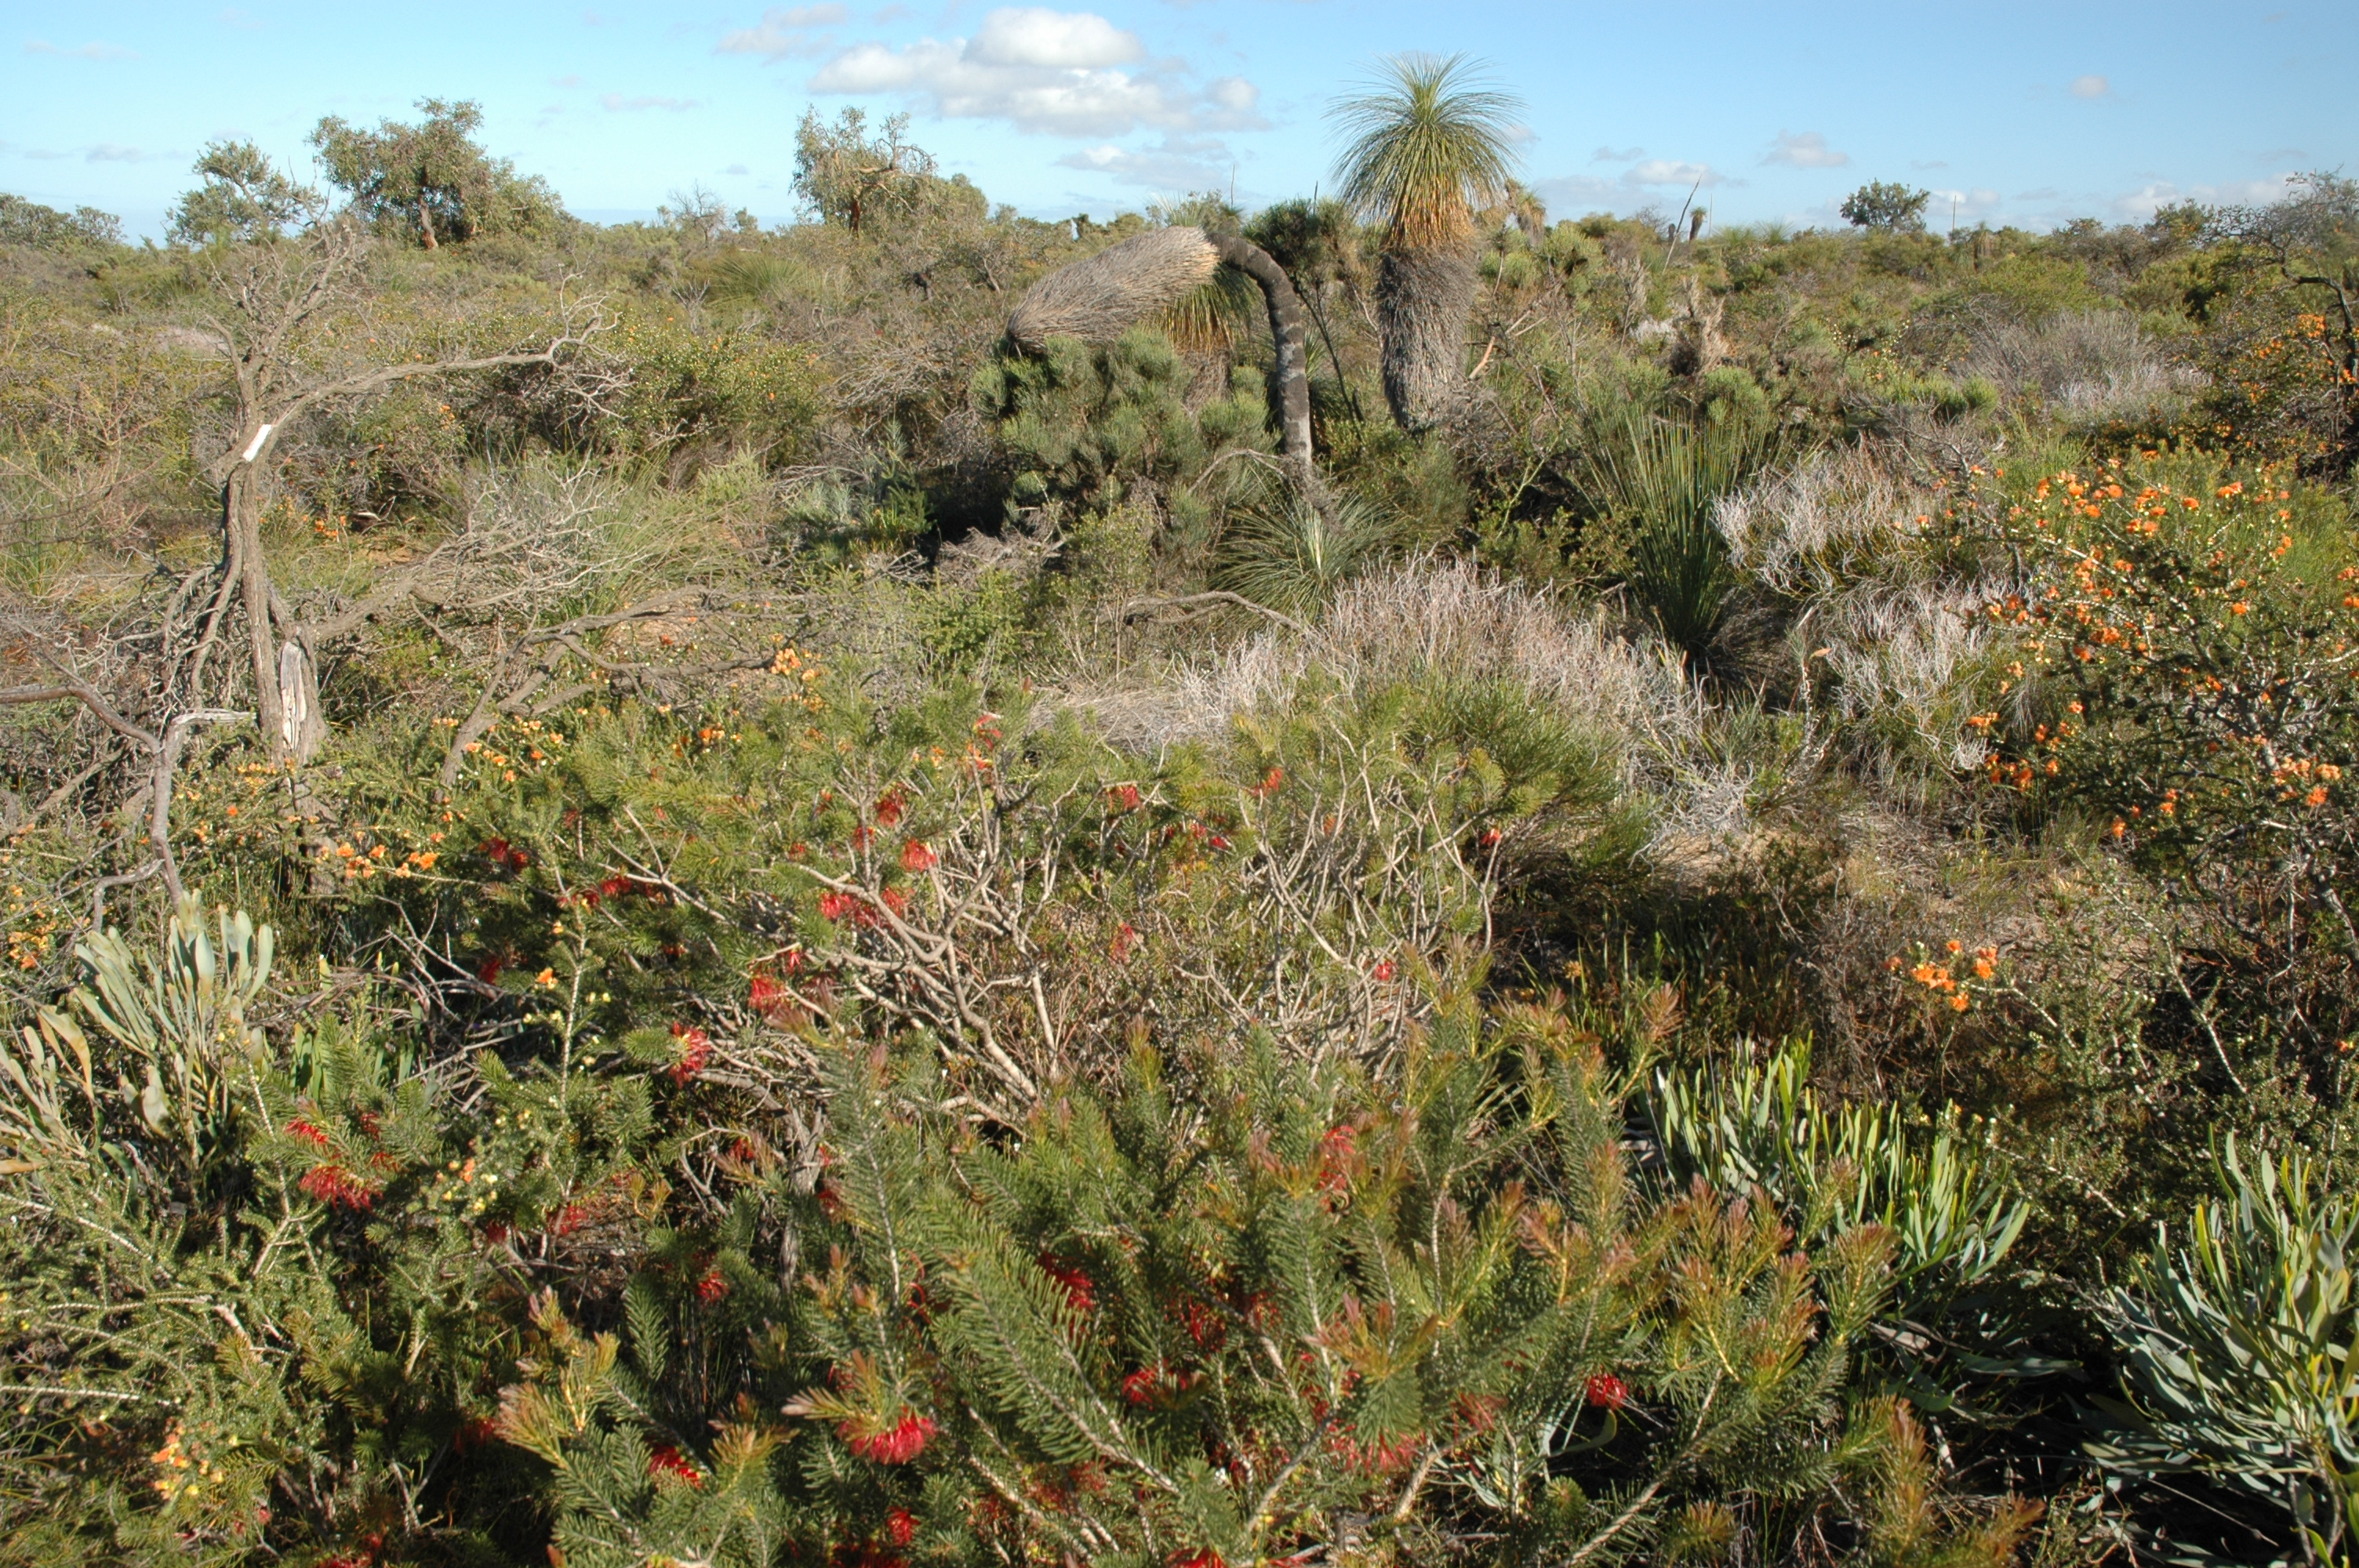 Soil organisms maintain high plant diversity sveriges for Soil organisms